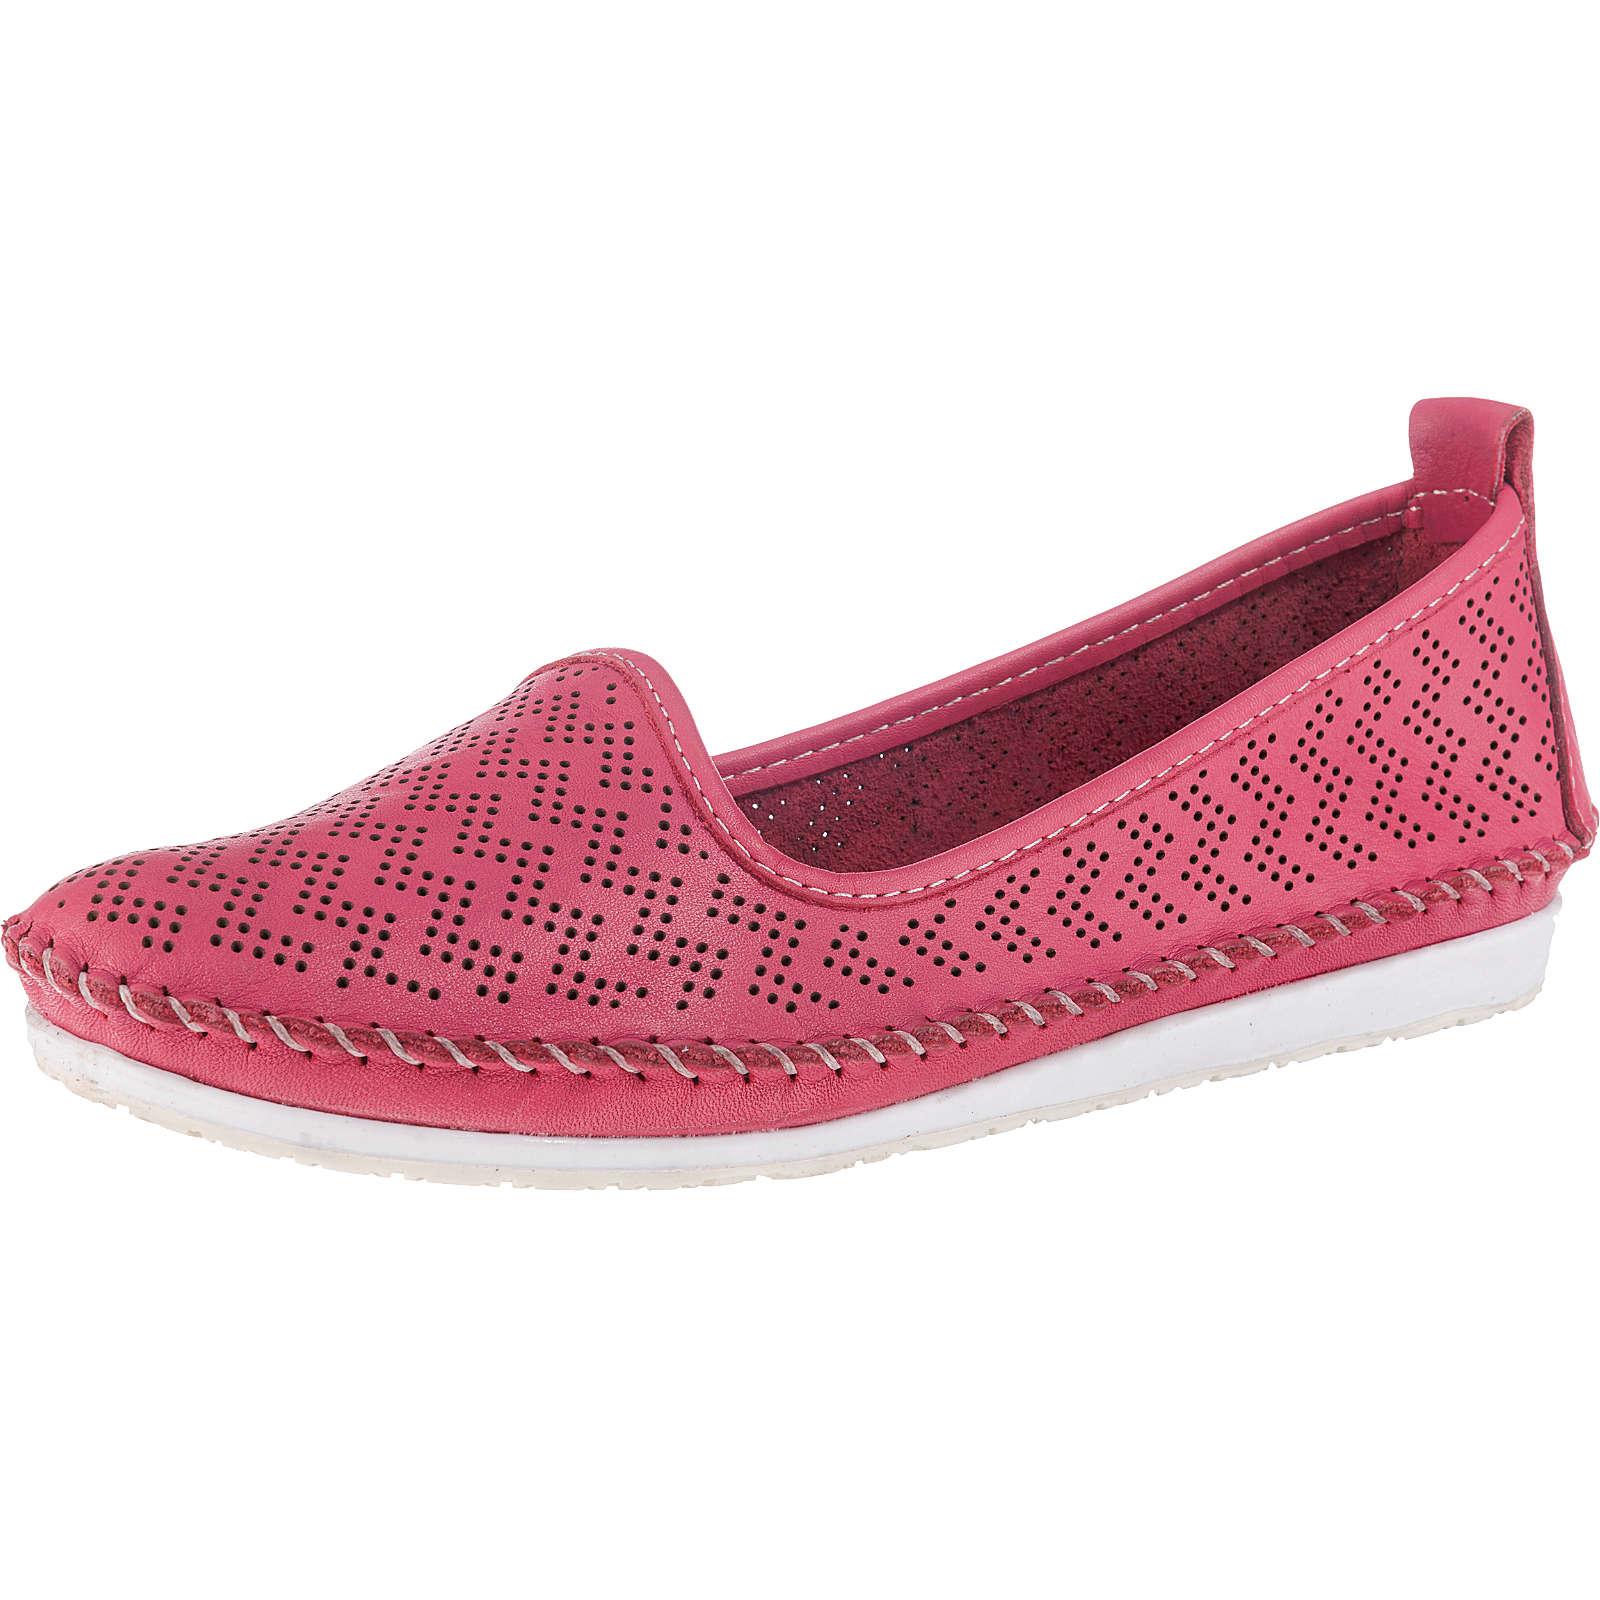 Andrea Conti Klassische Slipper pink Damen Gr. 39